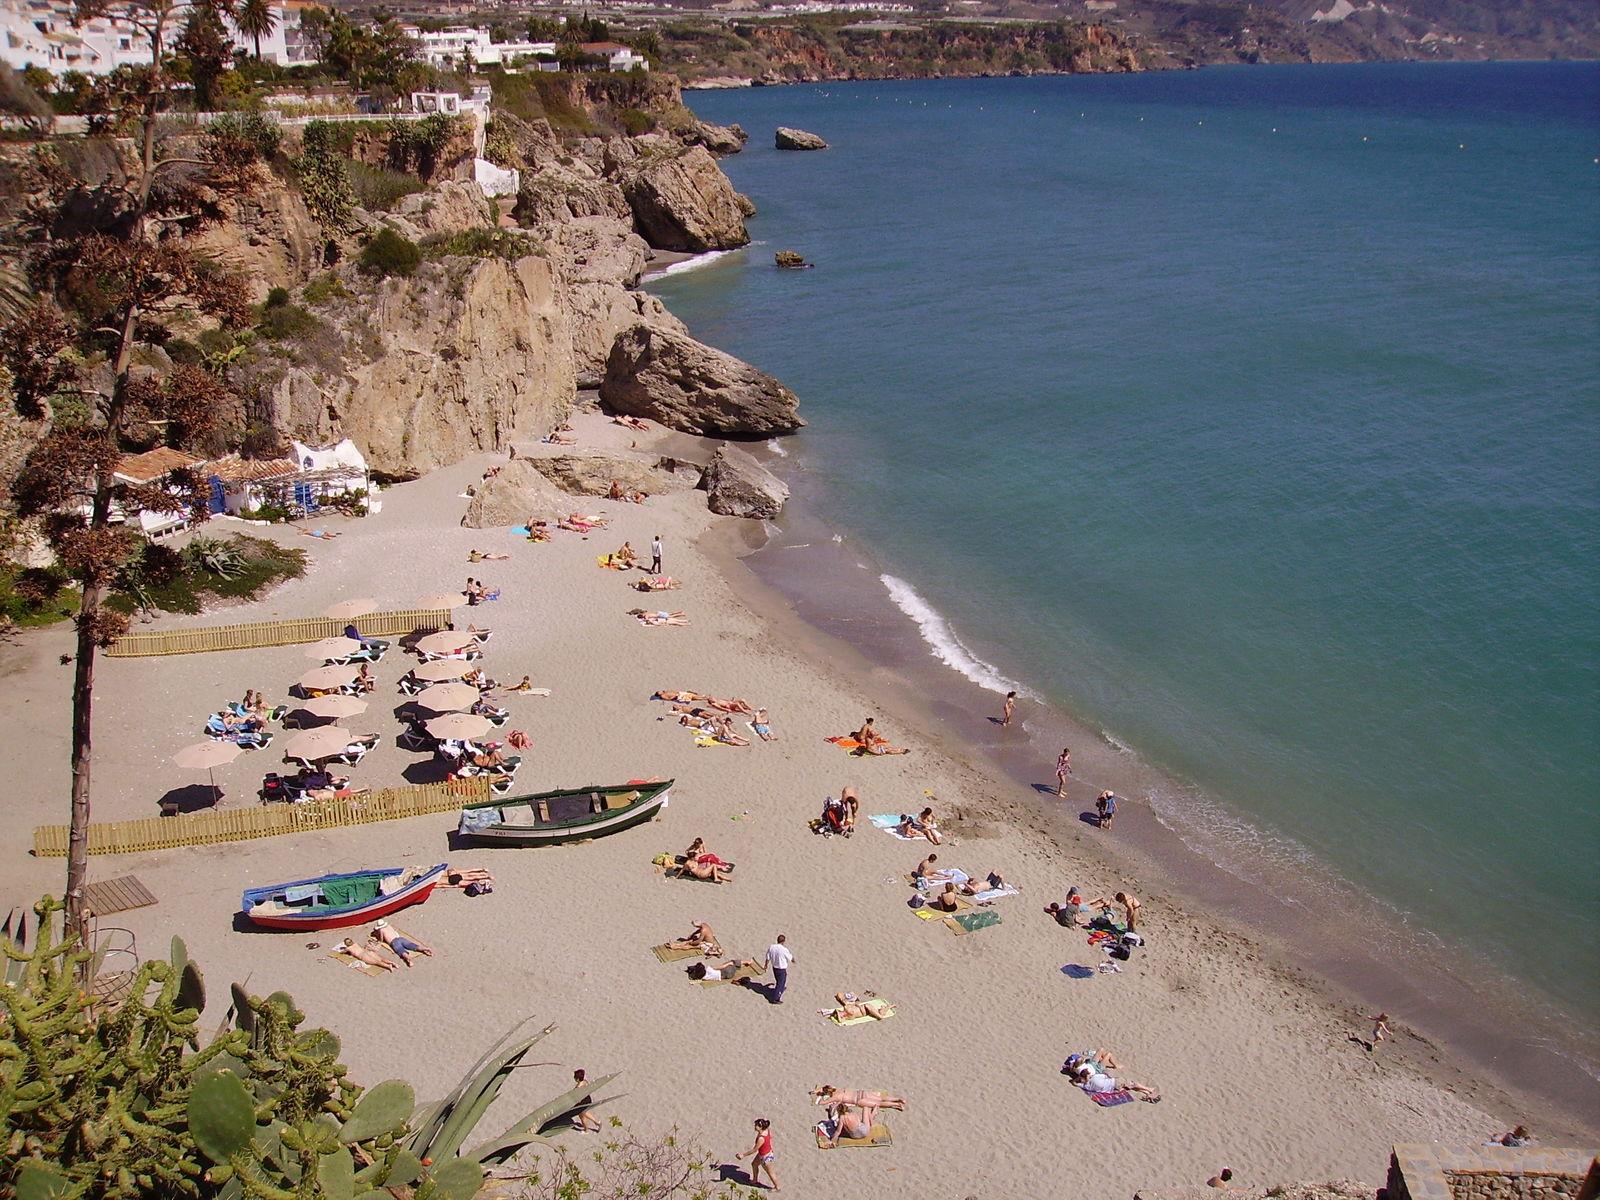 Playas de Nerja